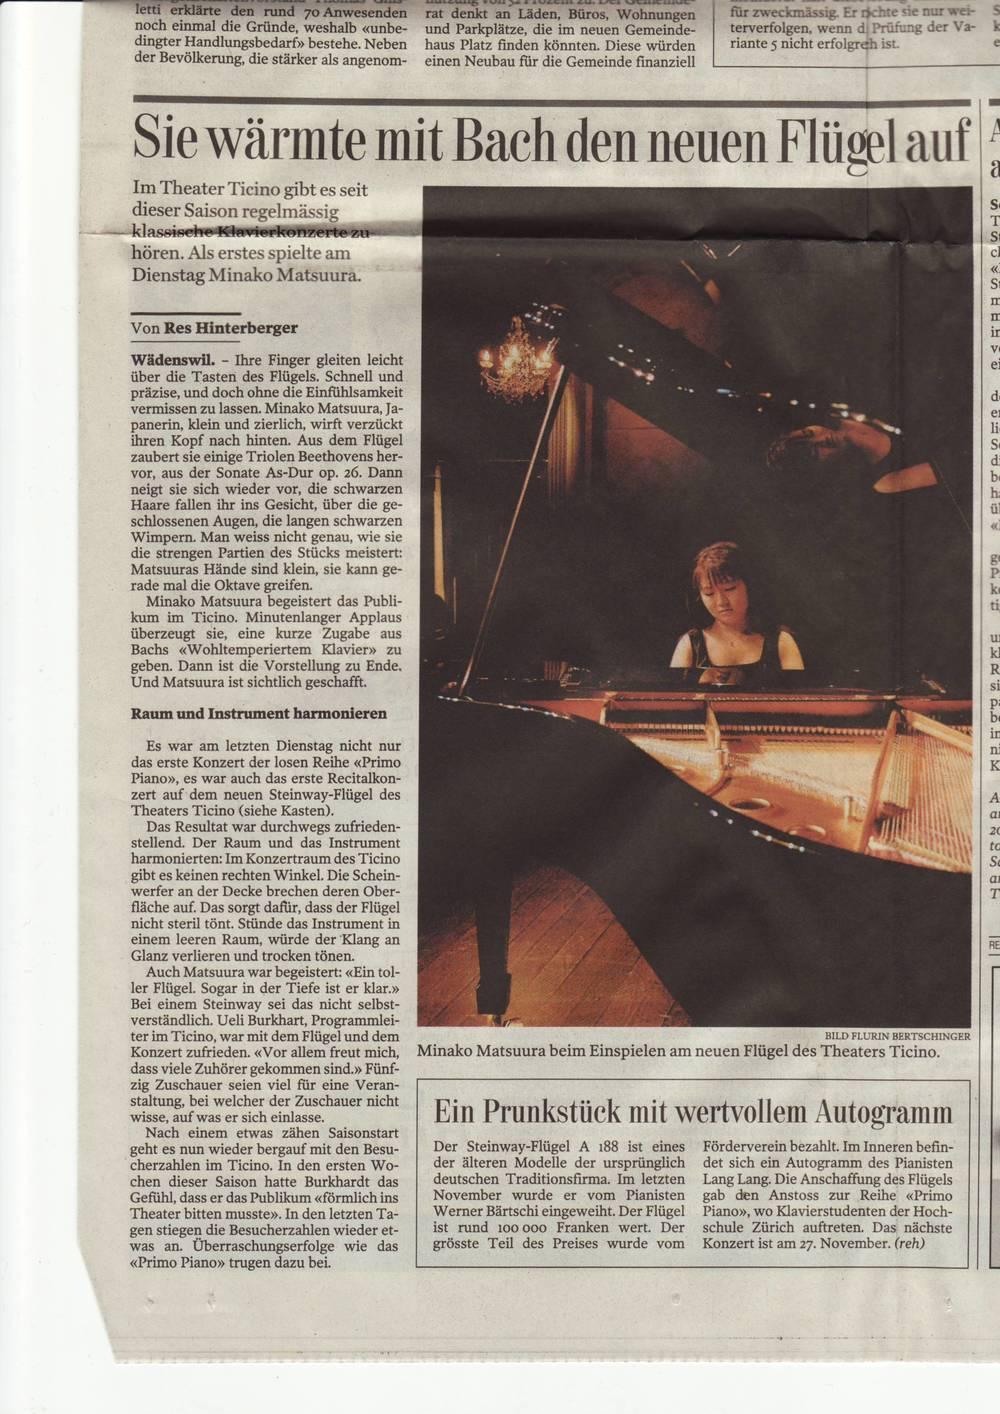 Tages-Anzeiger 24. Okt.2008.JPG